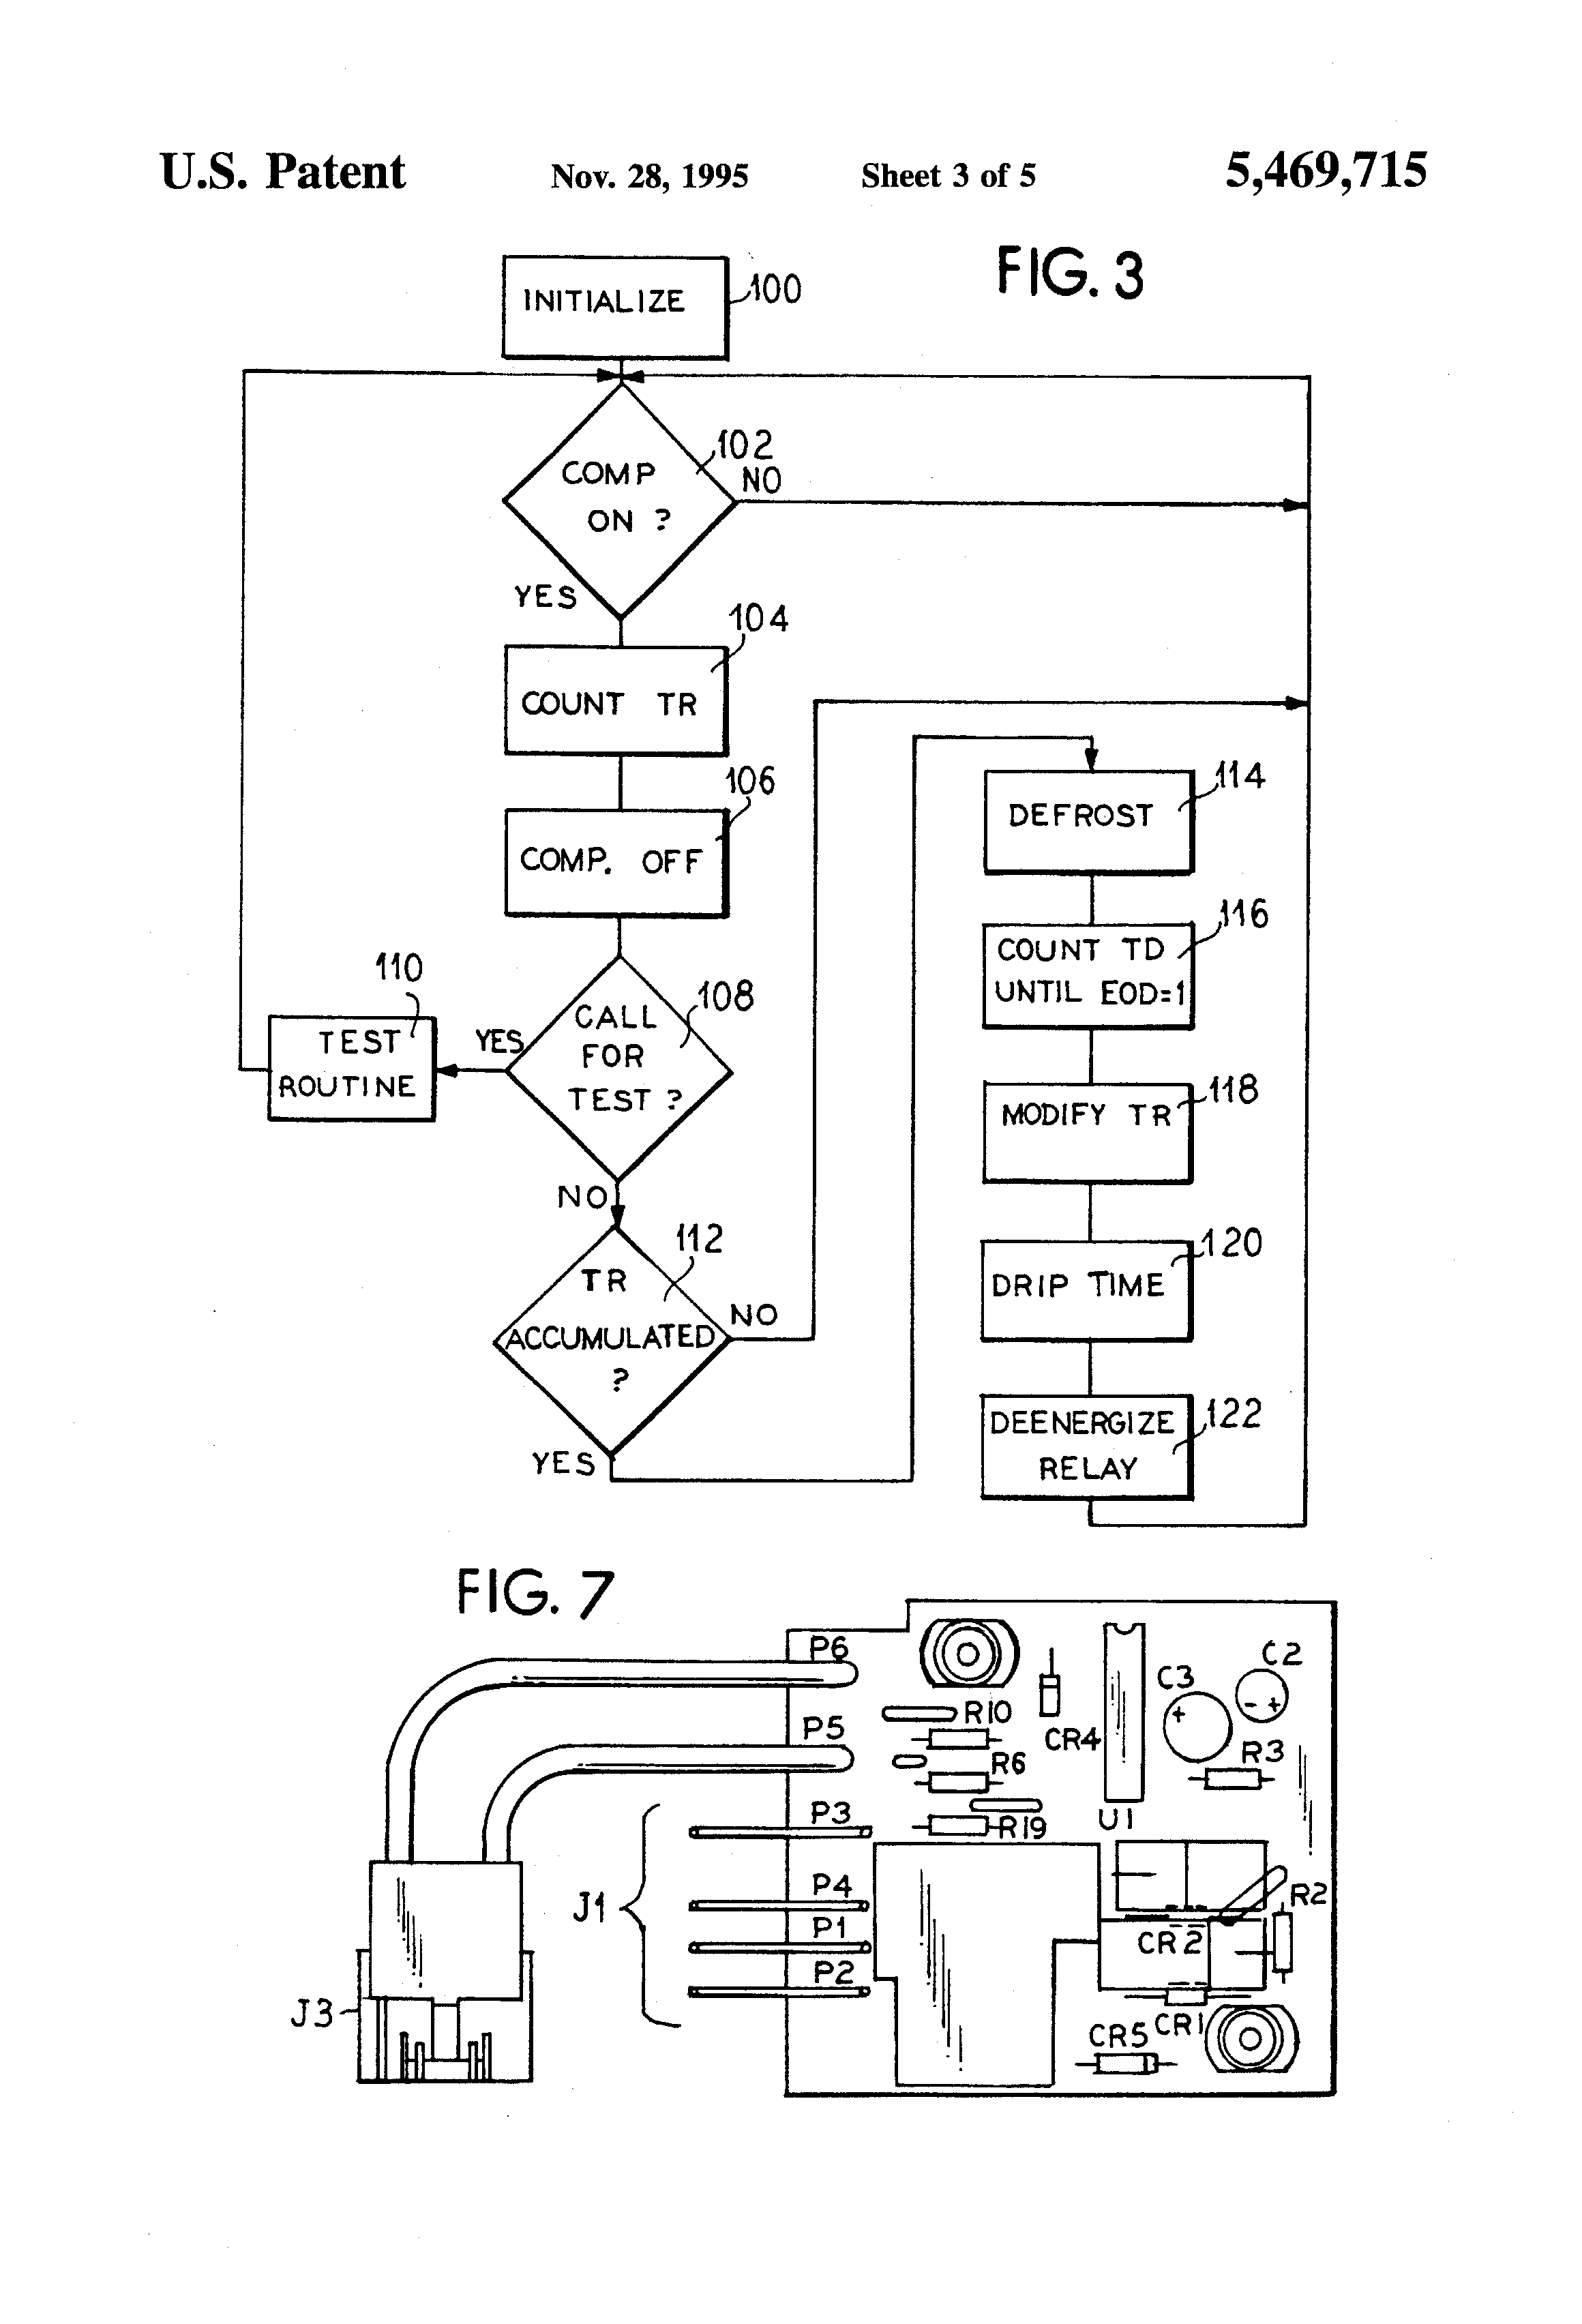 whirlpool freezer wiring diagram da 7795  defrost timer wiring diagram additionally whirlpool  da 7795  defrost timer wiring diagram